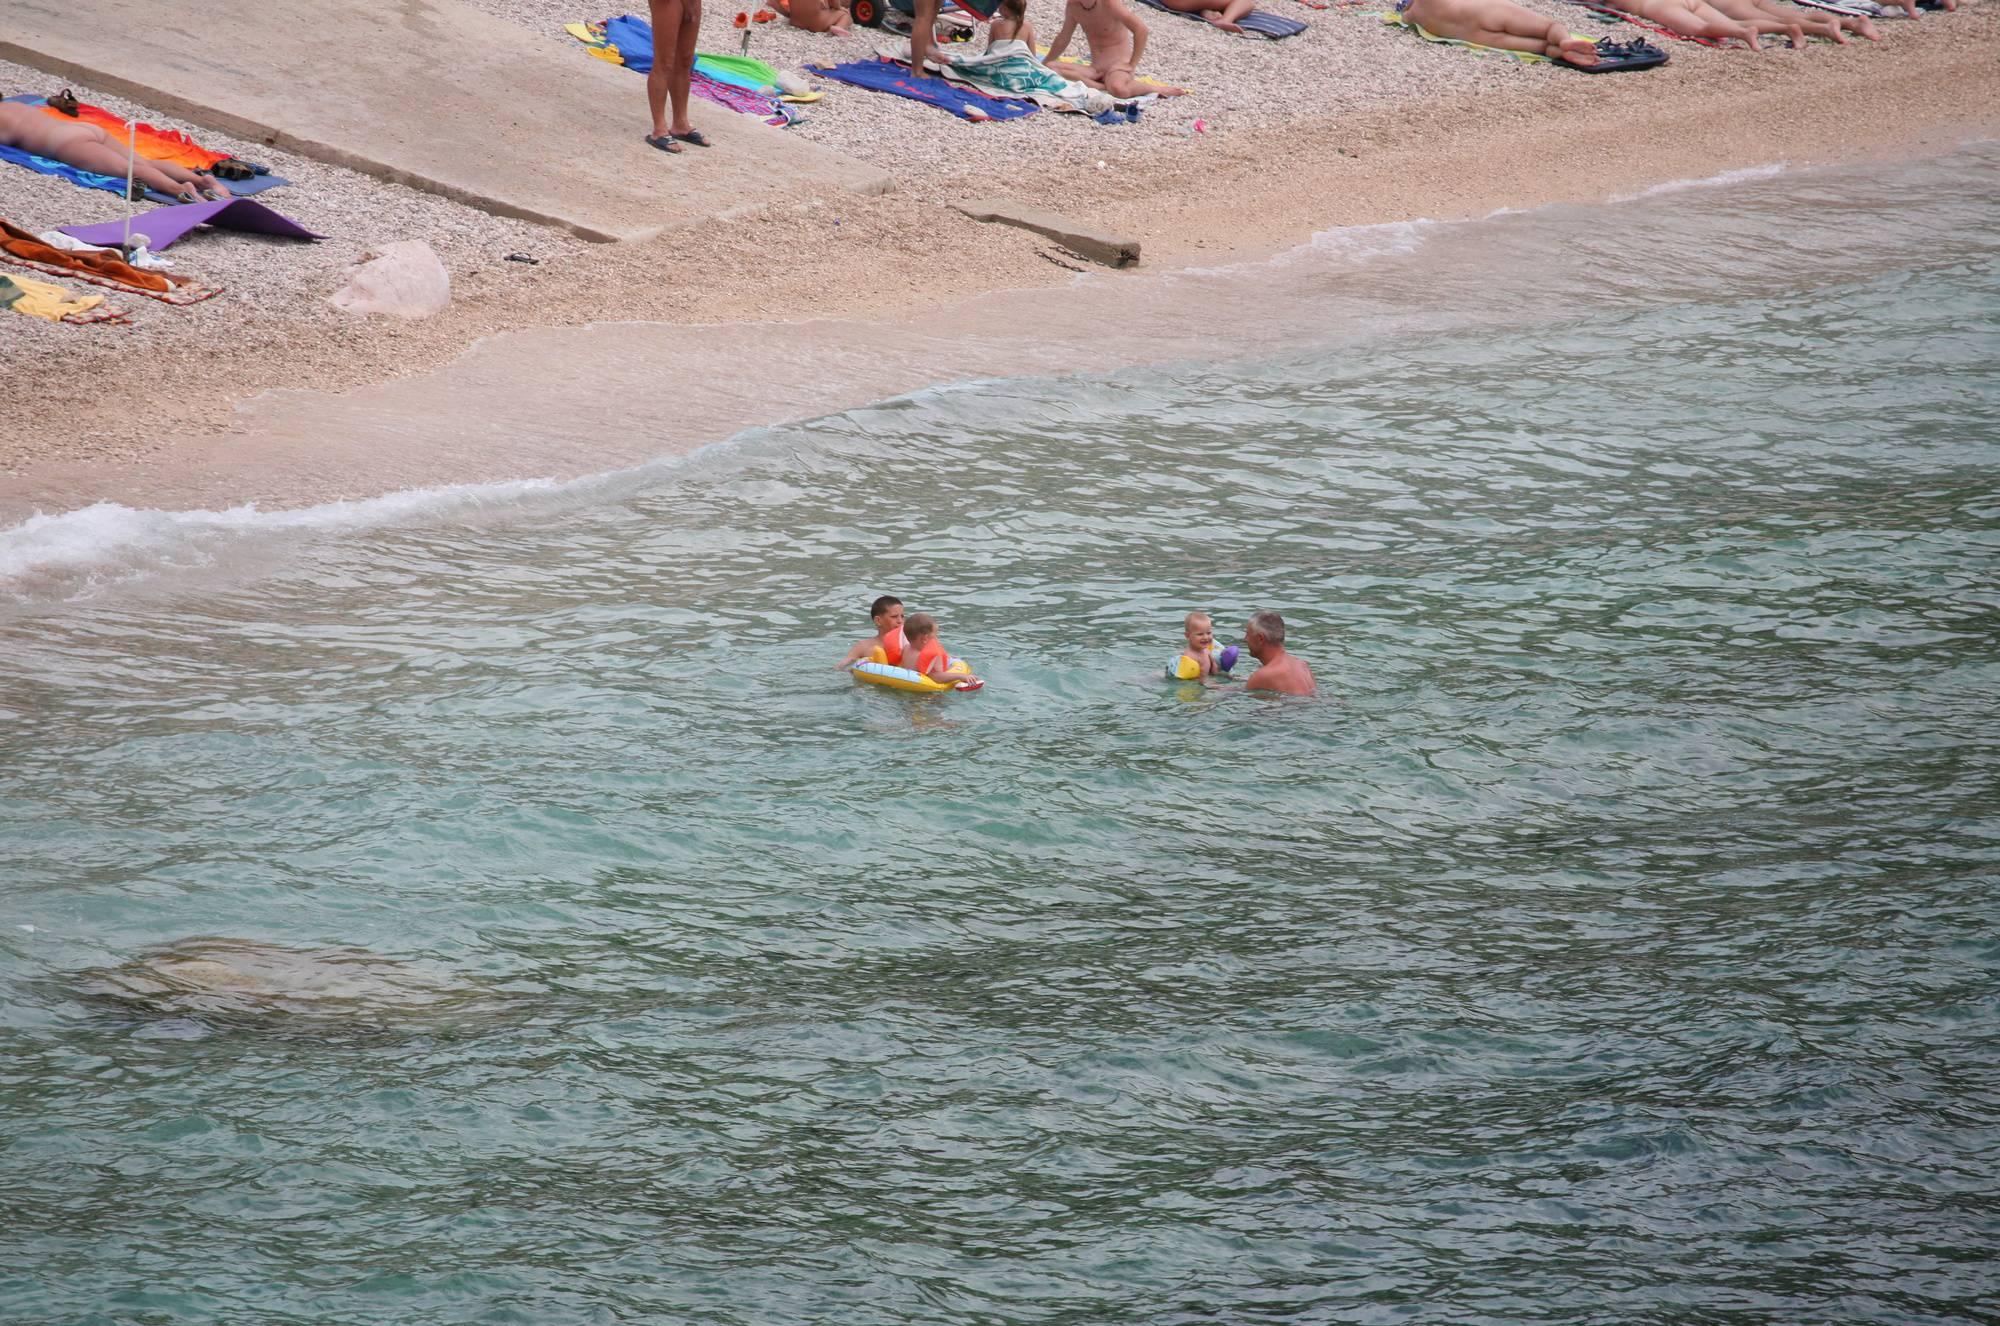 Nudist Photos Wide Maslin Beach View - 2